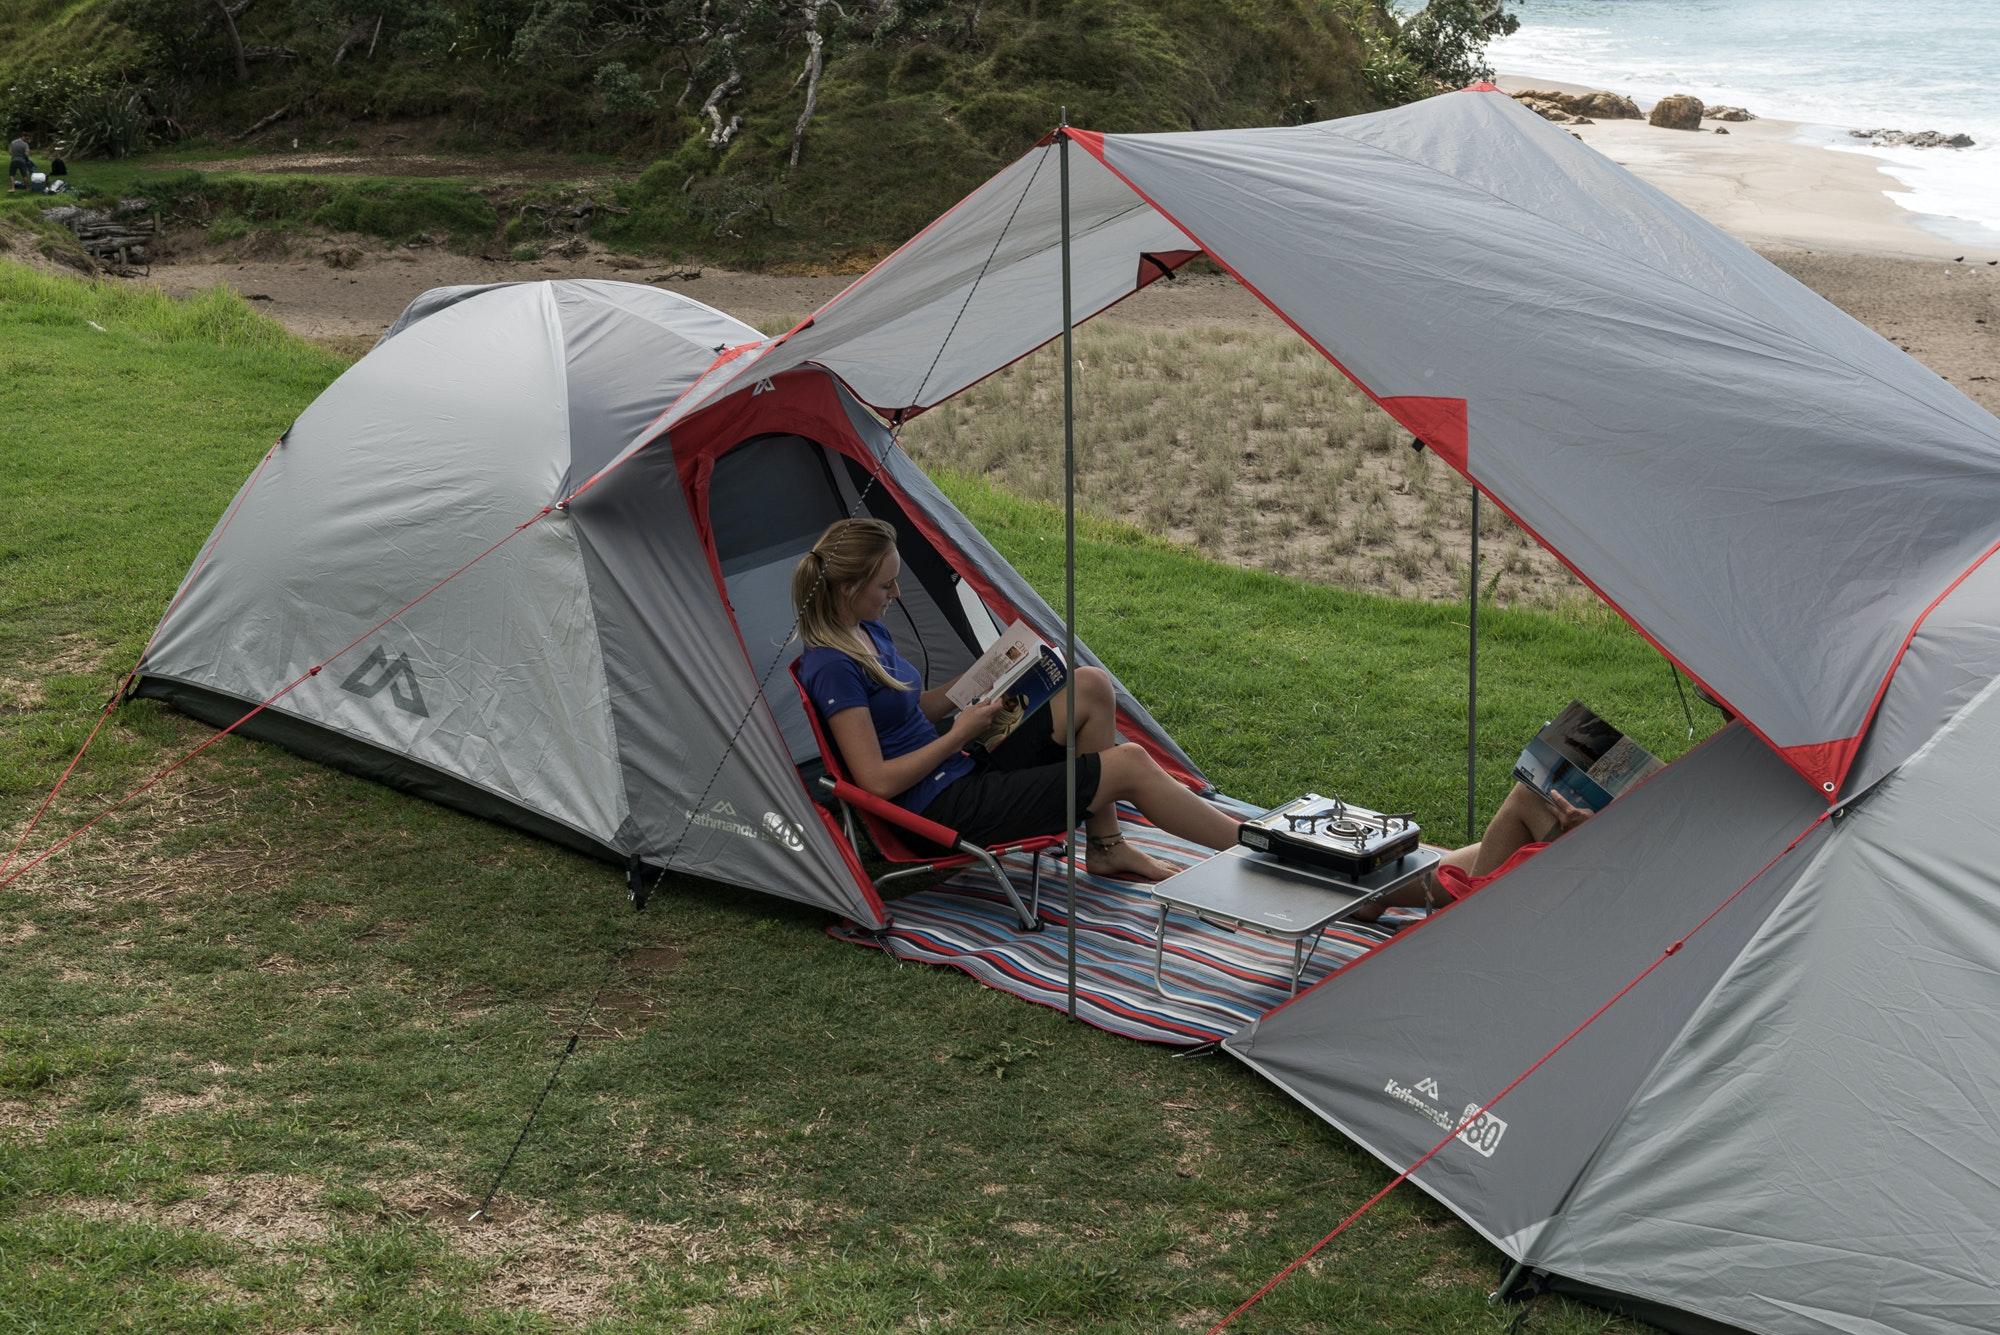 NEW-Kathmandu-Retreat-40-2-Person-Waterproof-Compact-Camping-Hiking-Tent thumbnail 9